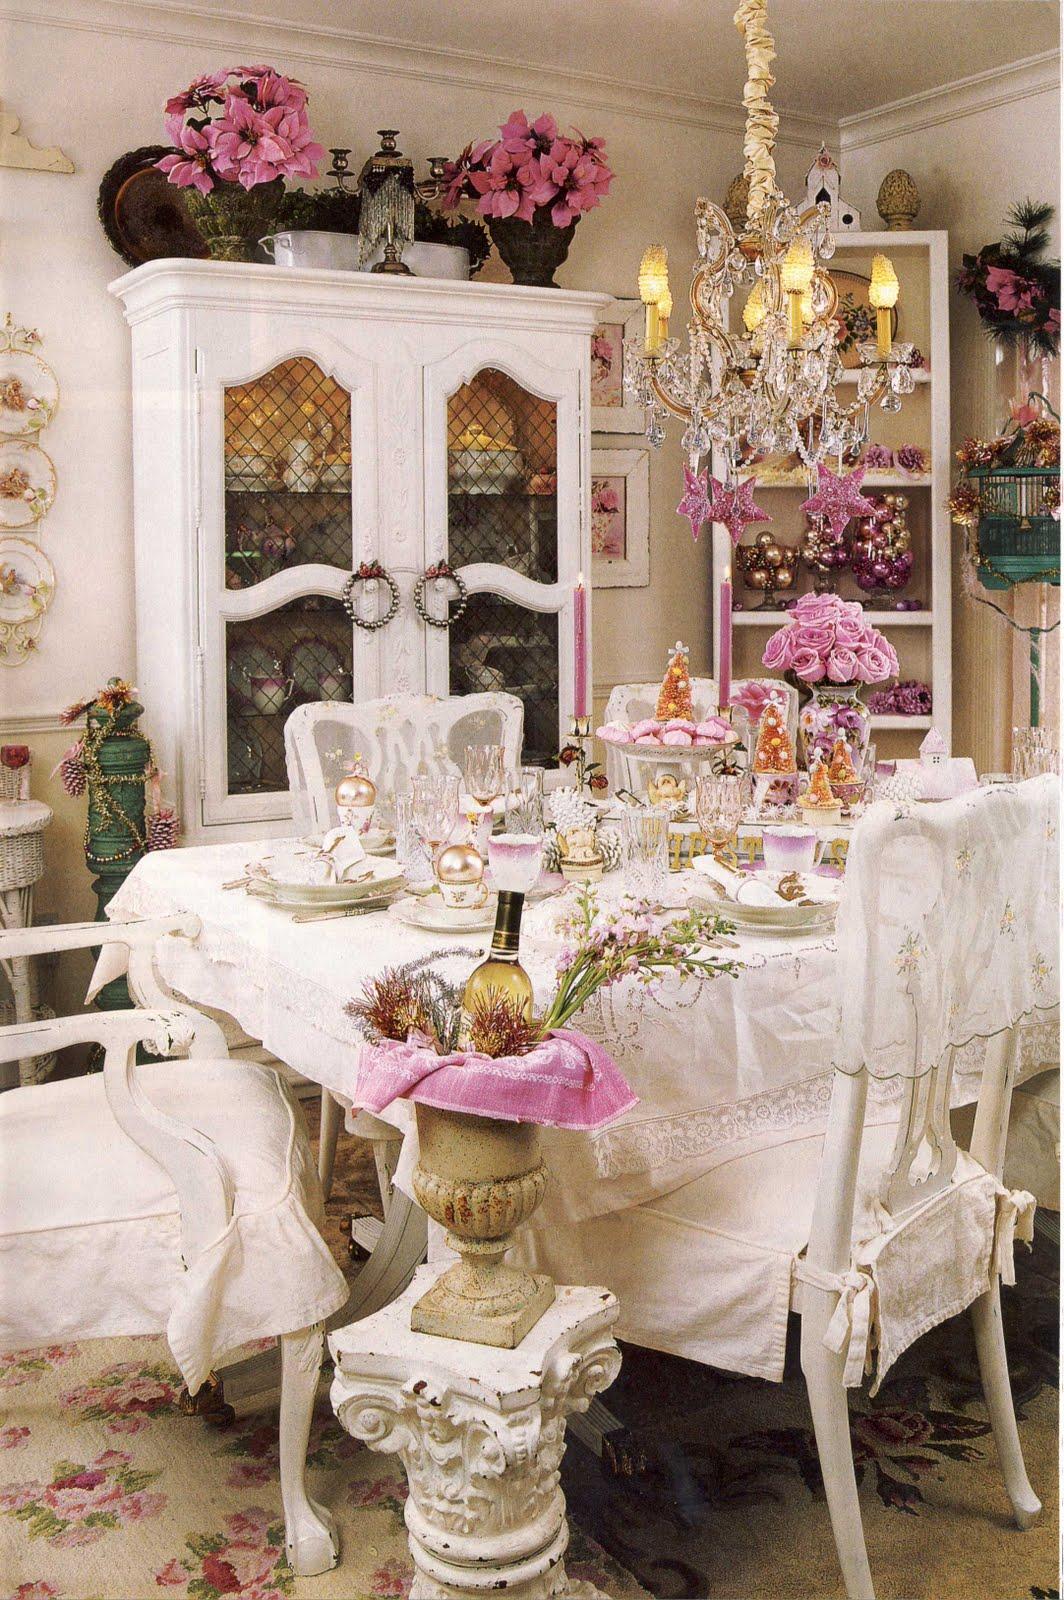 Романтический декор в стиле прованс